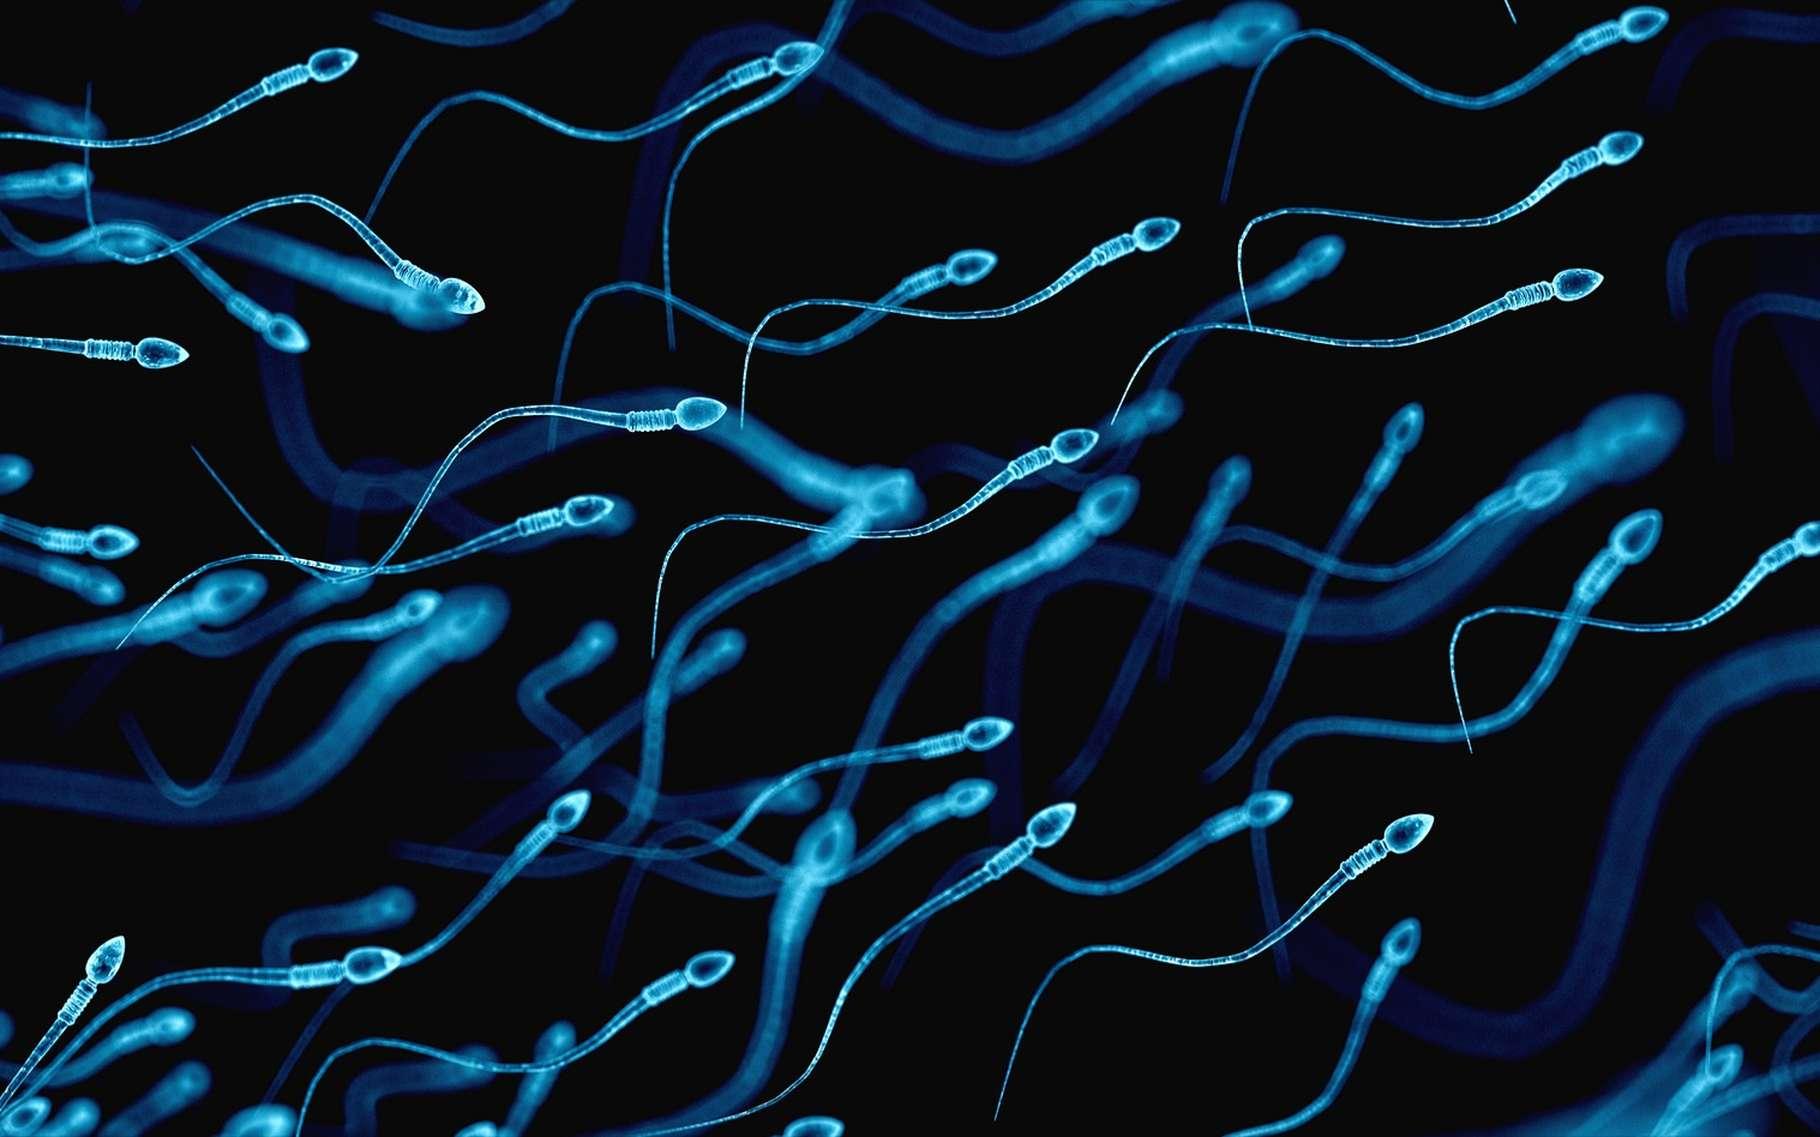 Les peptides étudiés peuvent ralentir les spermatozoïdes. © Sebastian Kaulitzki, Shutterstock